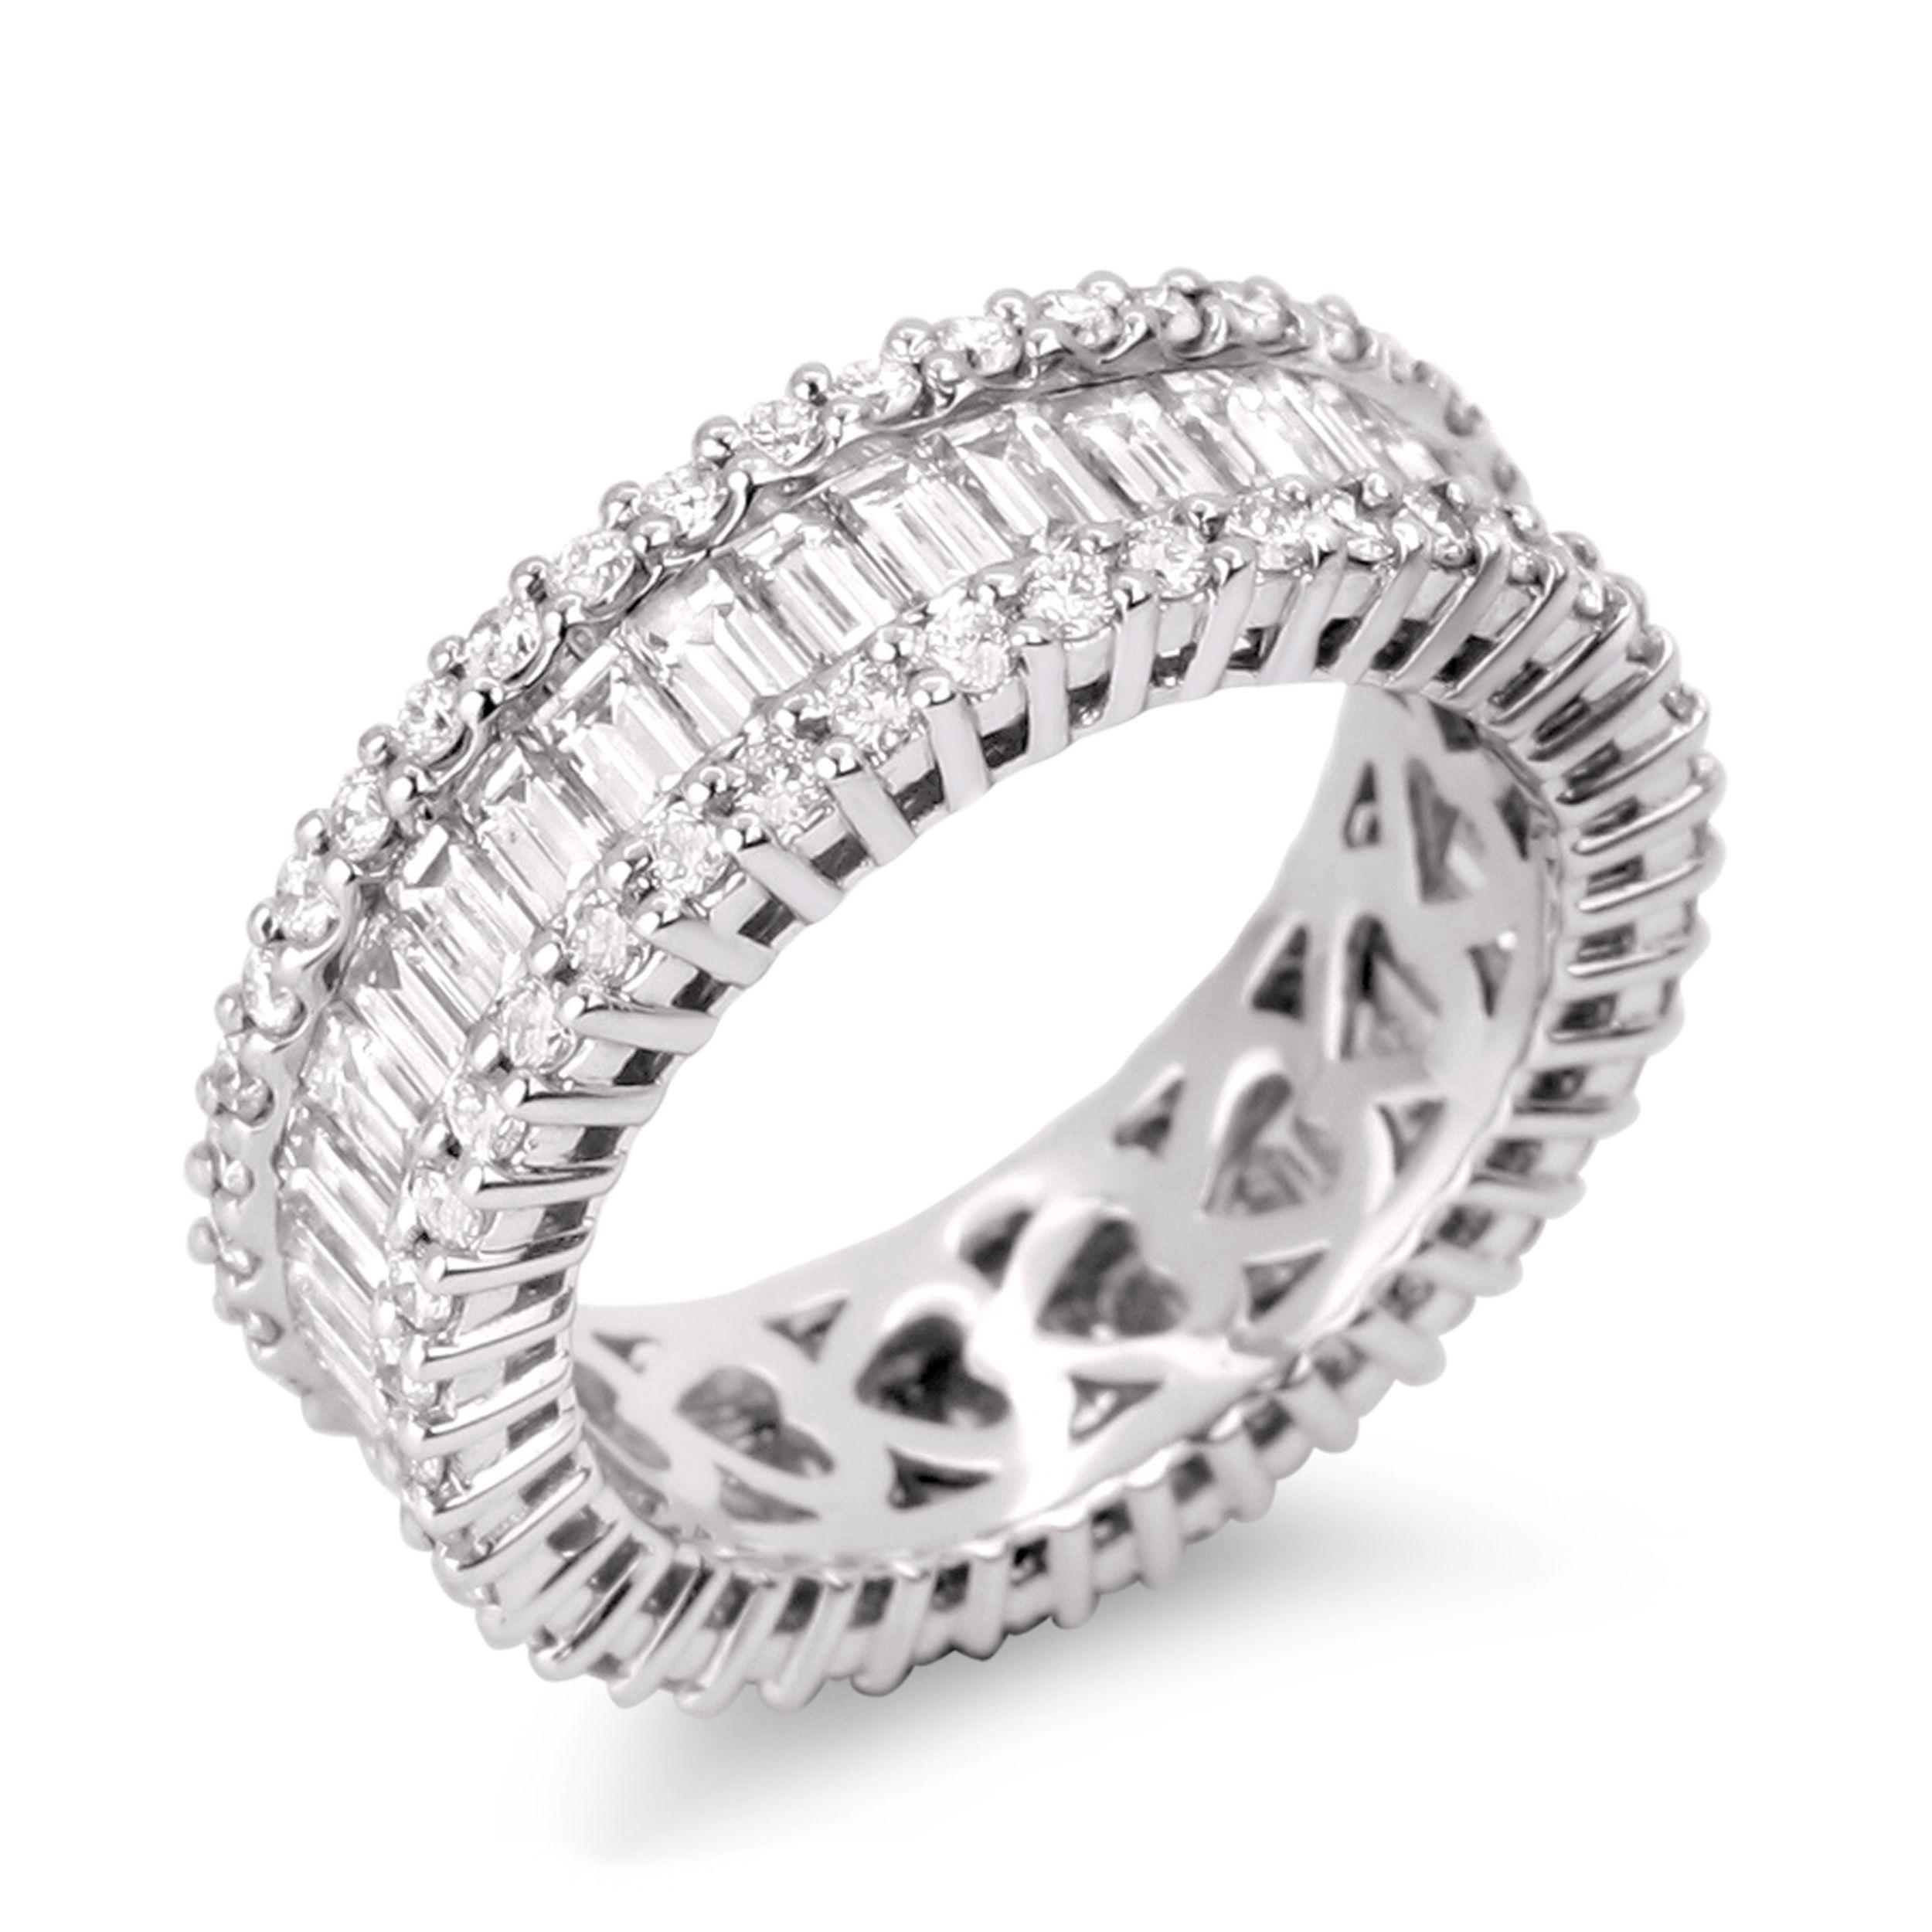 Diamond Anniversary Bands  Diamond Anniversary Rings Sgr754 (rings)